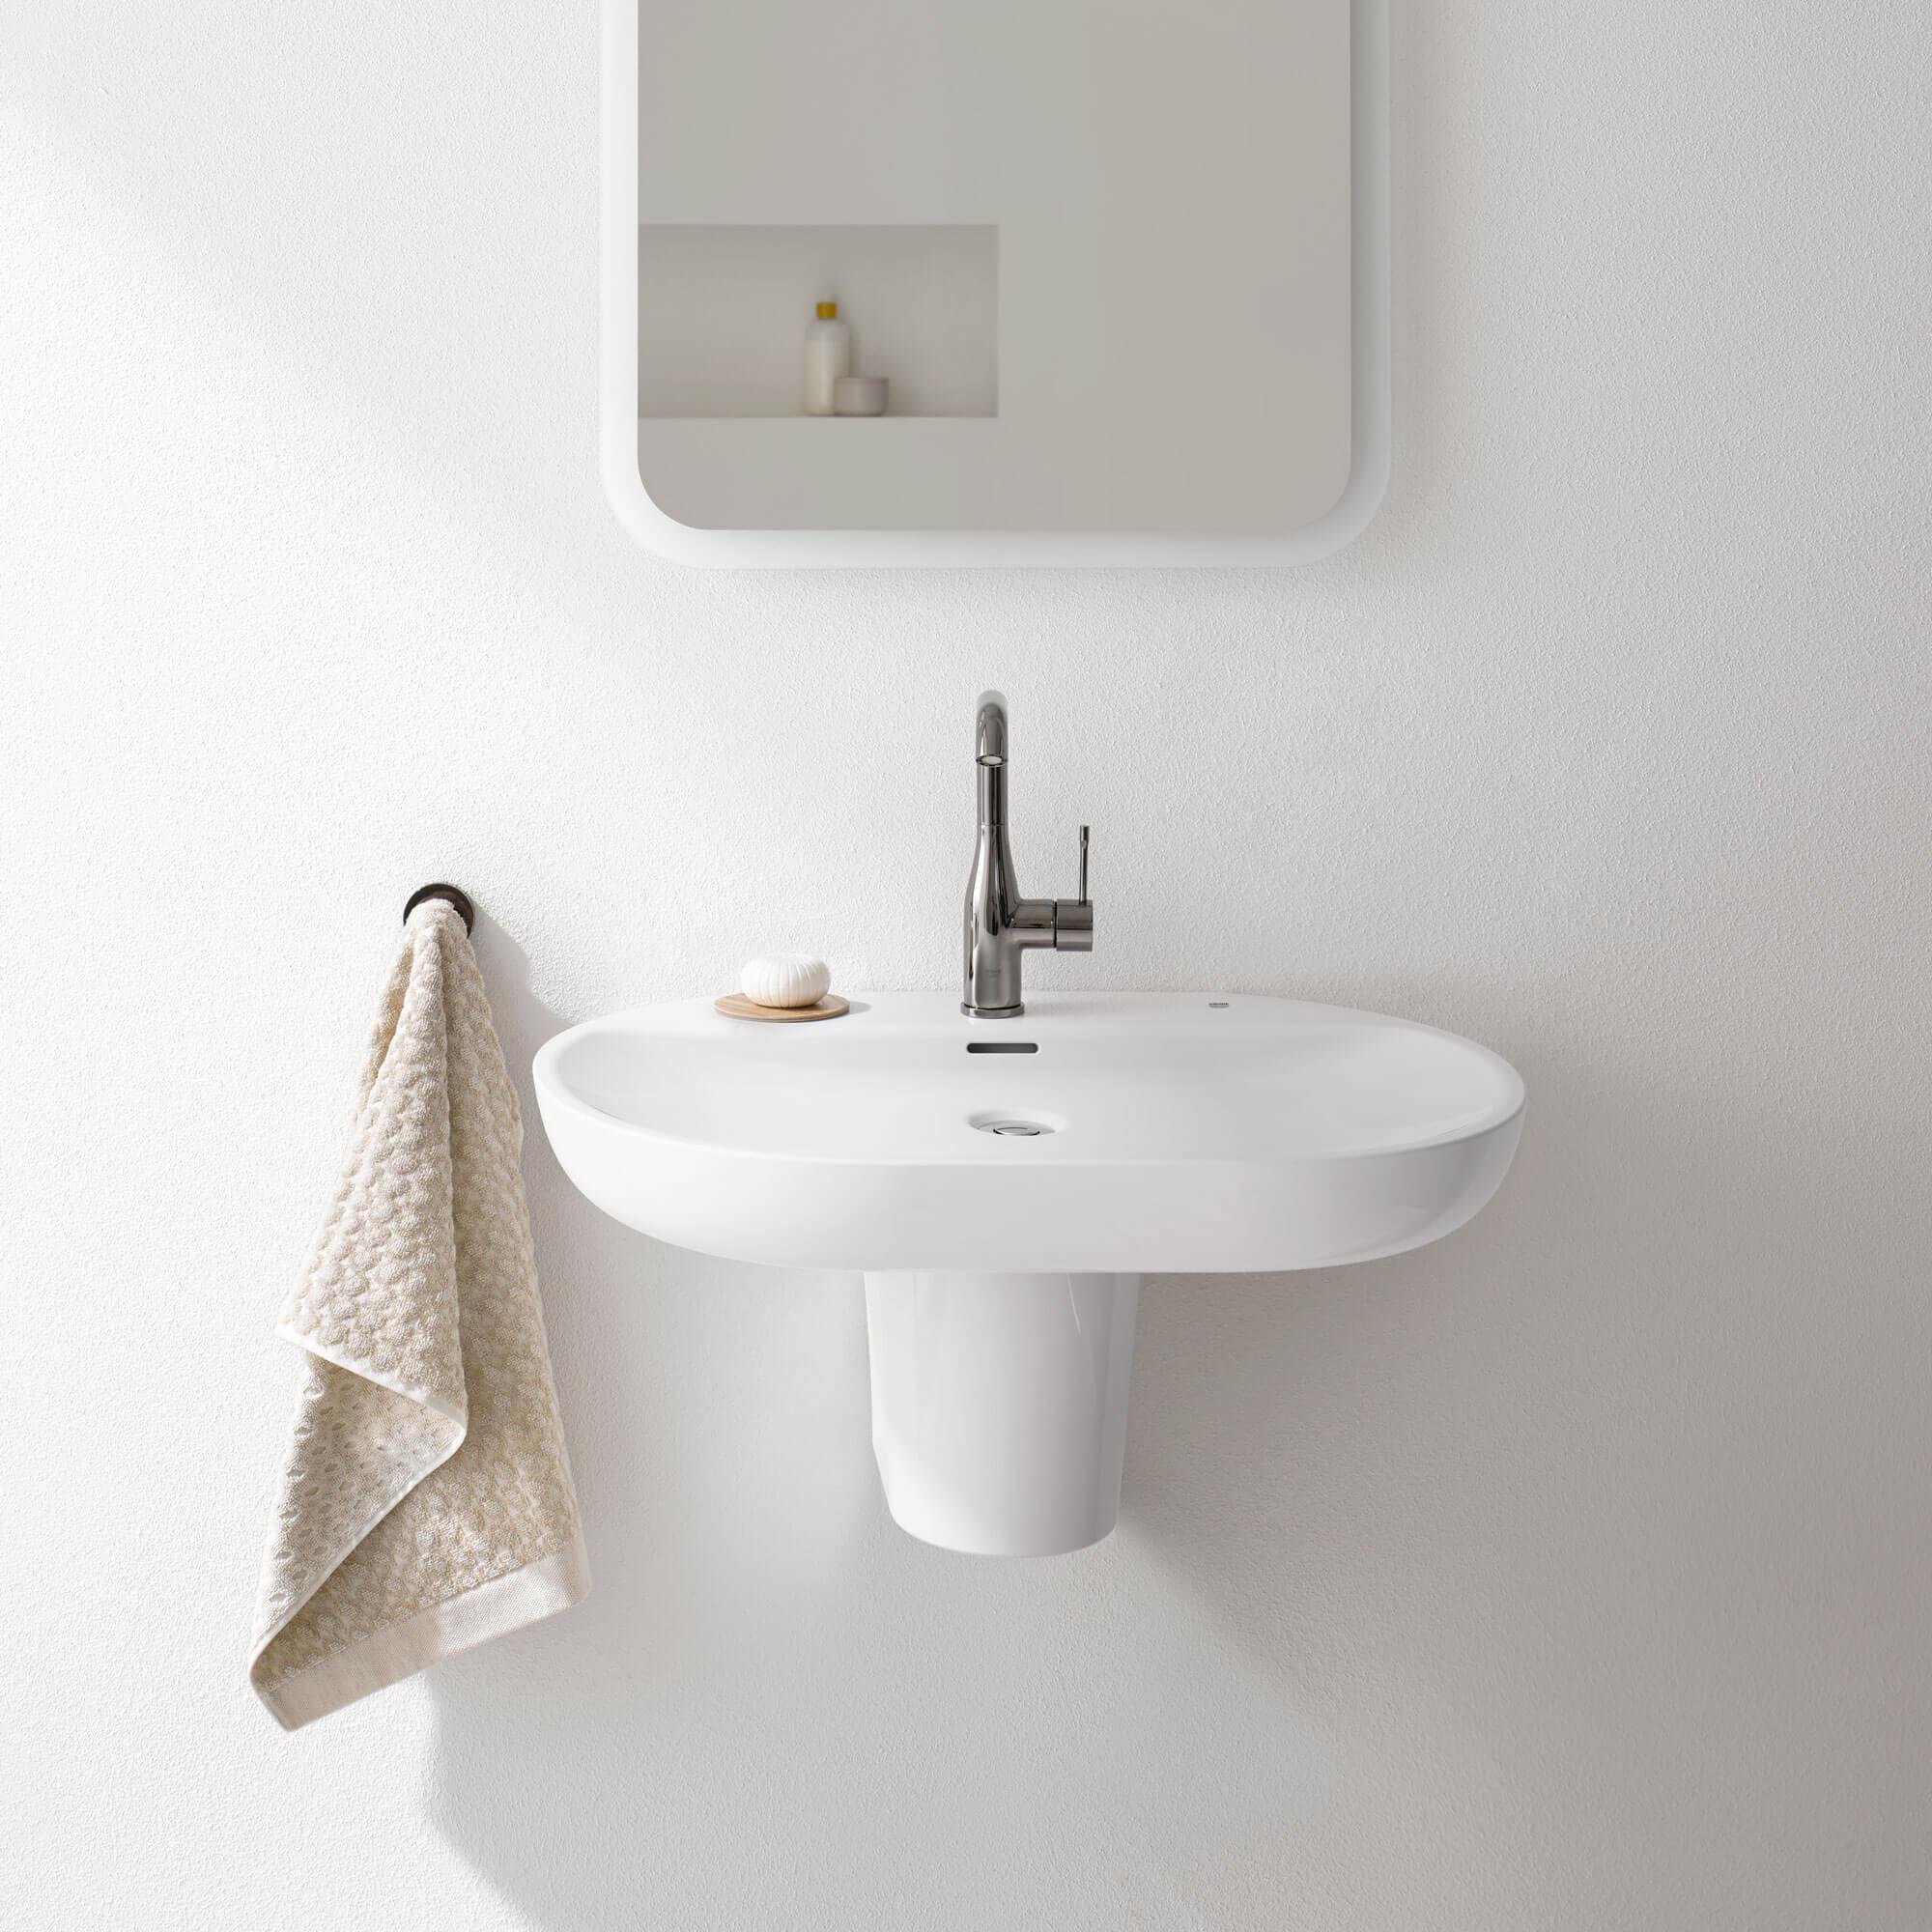 Bathroom Sinks Grohe